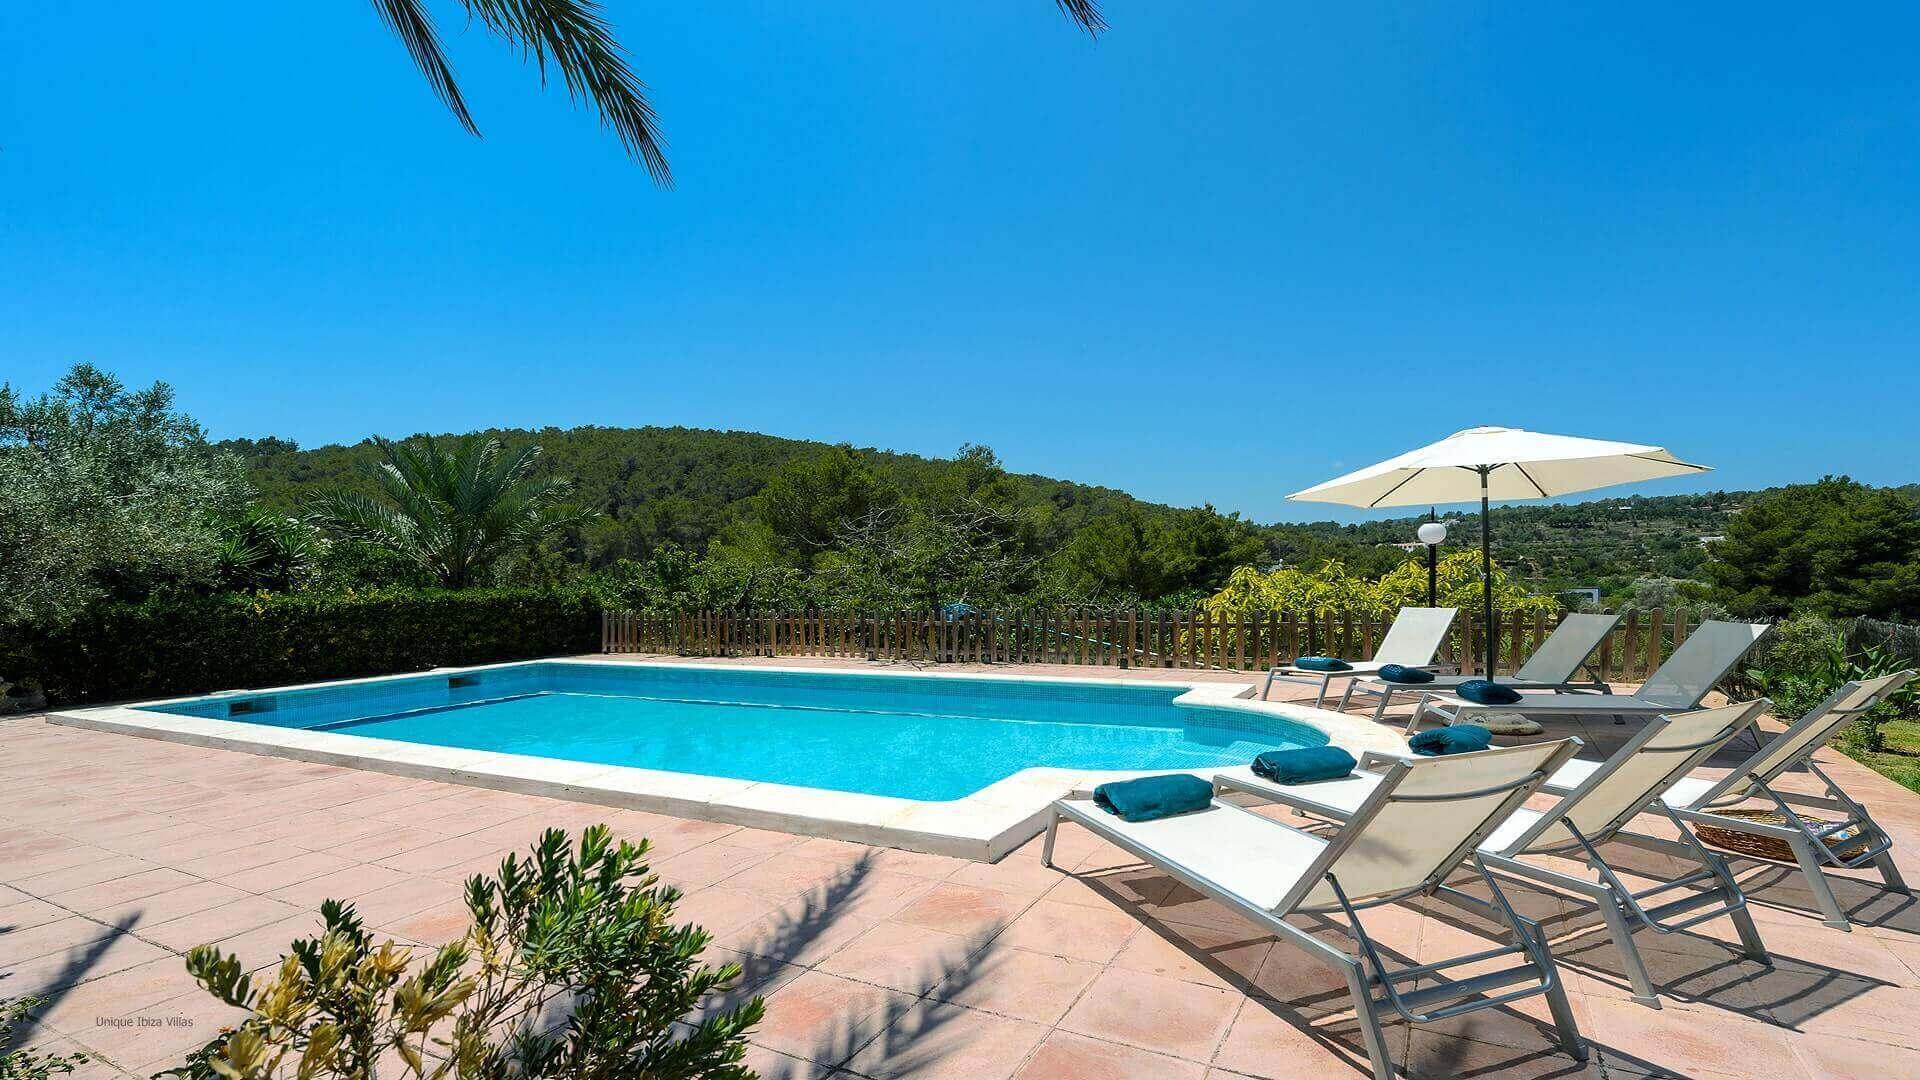 Casa Benirras Ibiza 4 Near Benirras